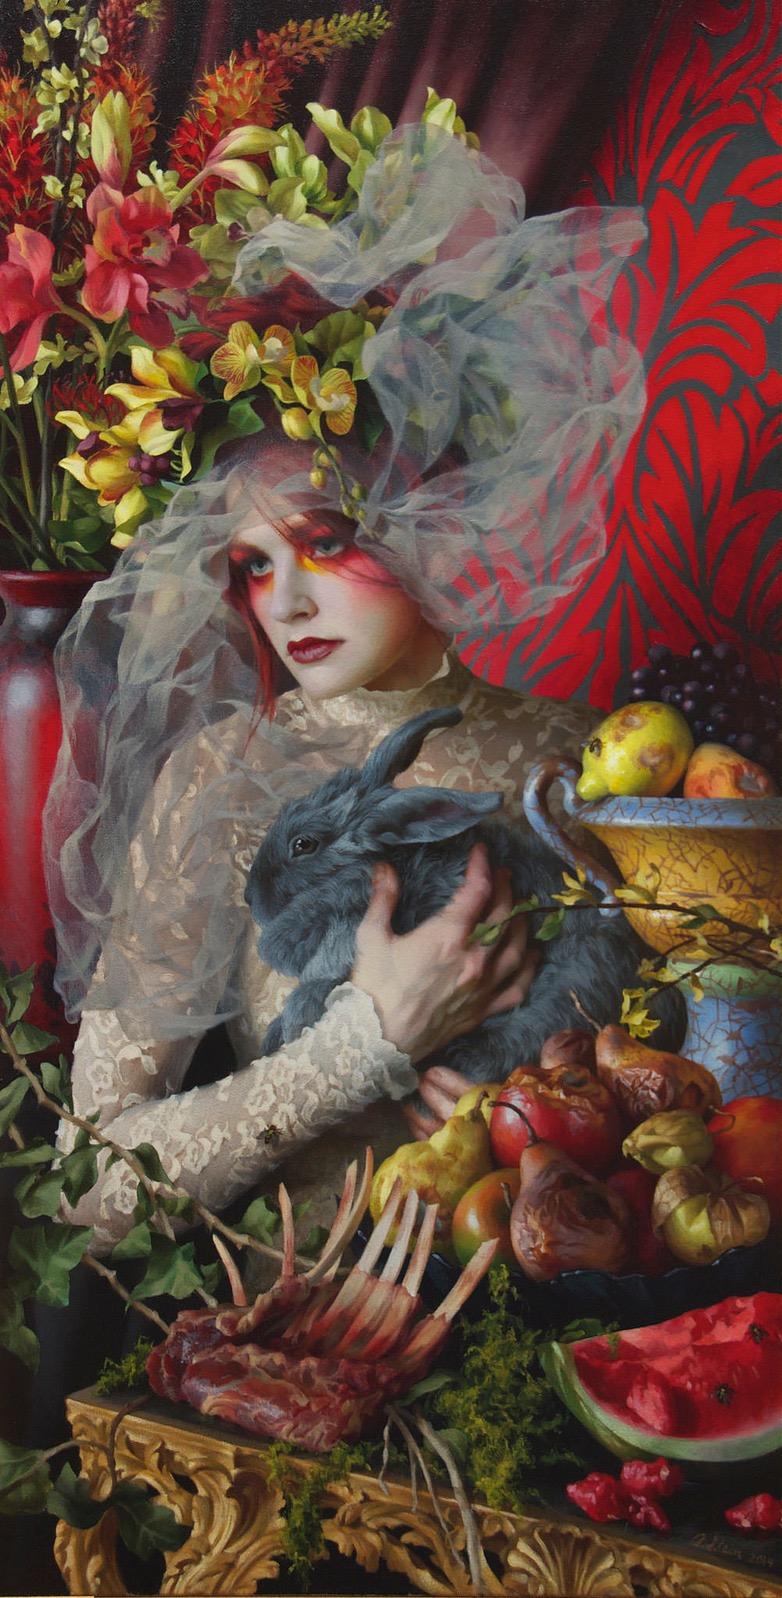 La Fête Sauvage, 2014 by Adrienne Stein